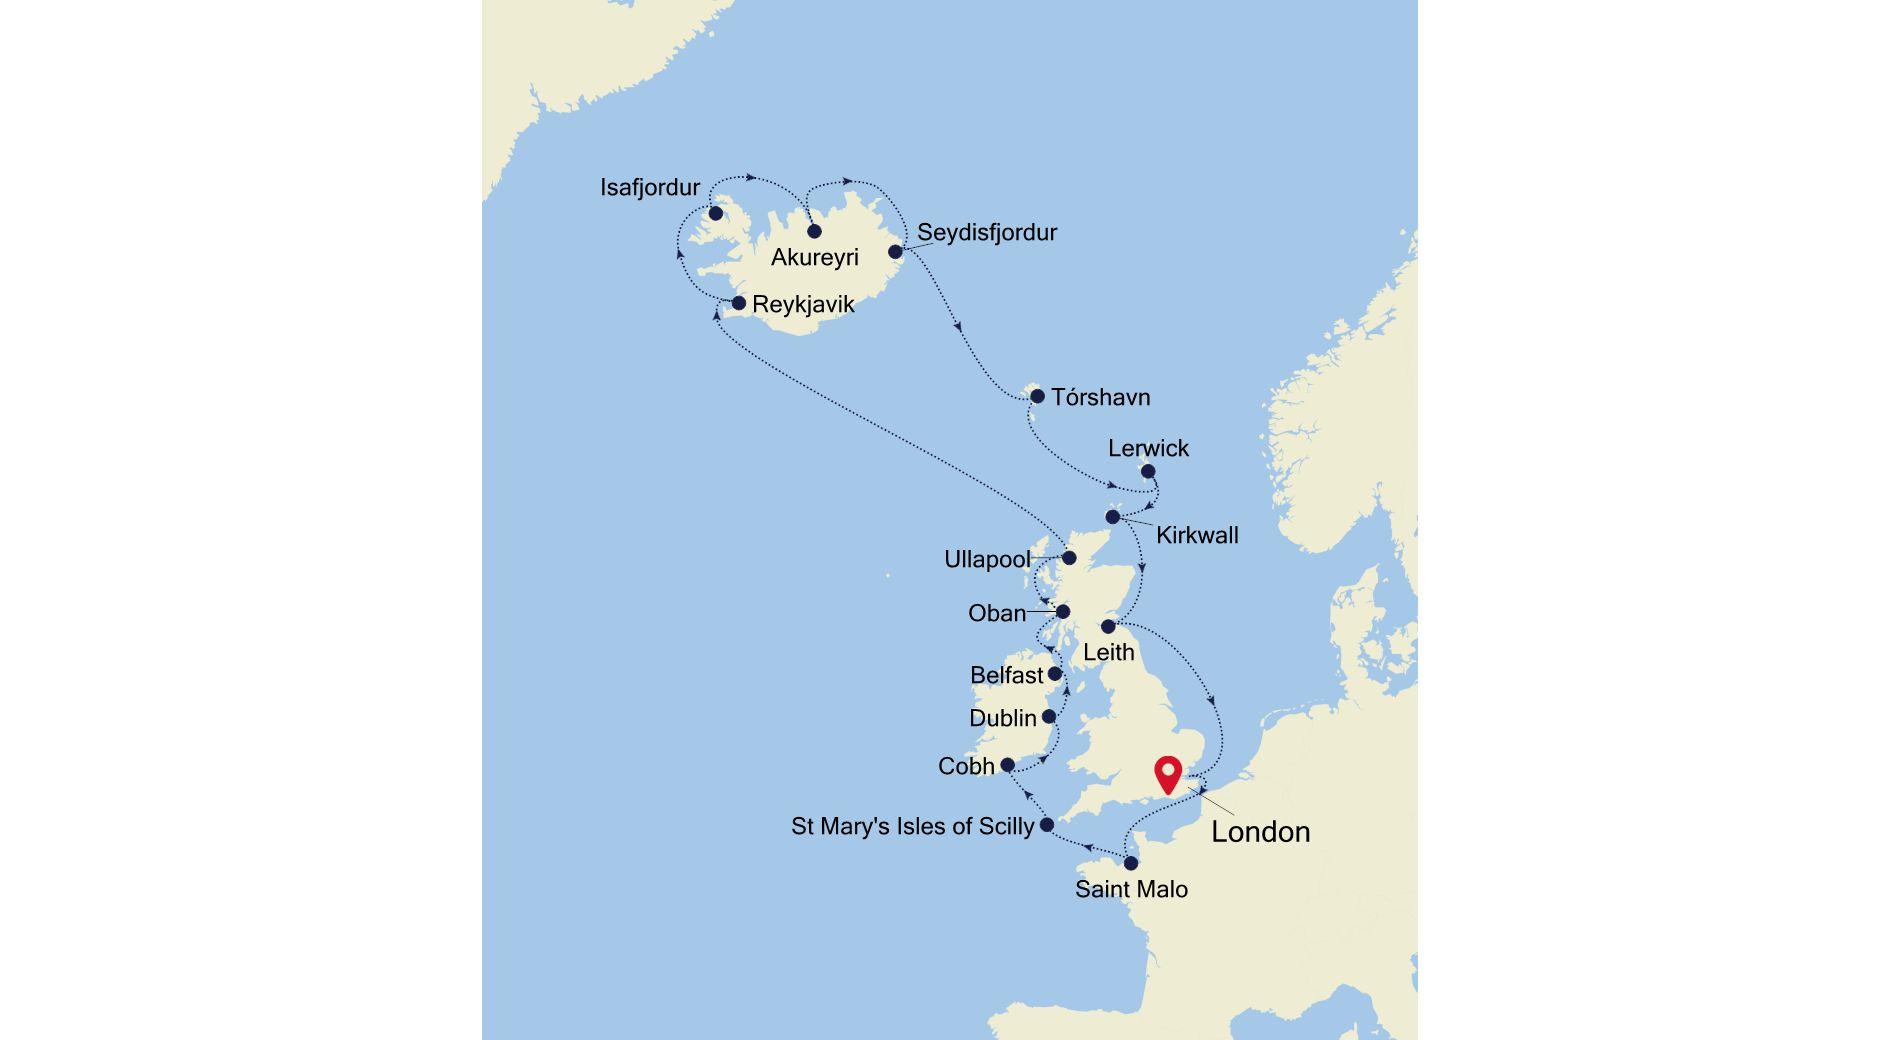 C2921 - British Isles + Iceland